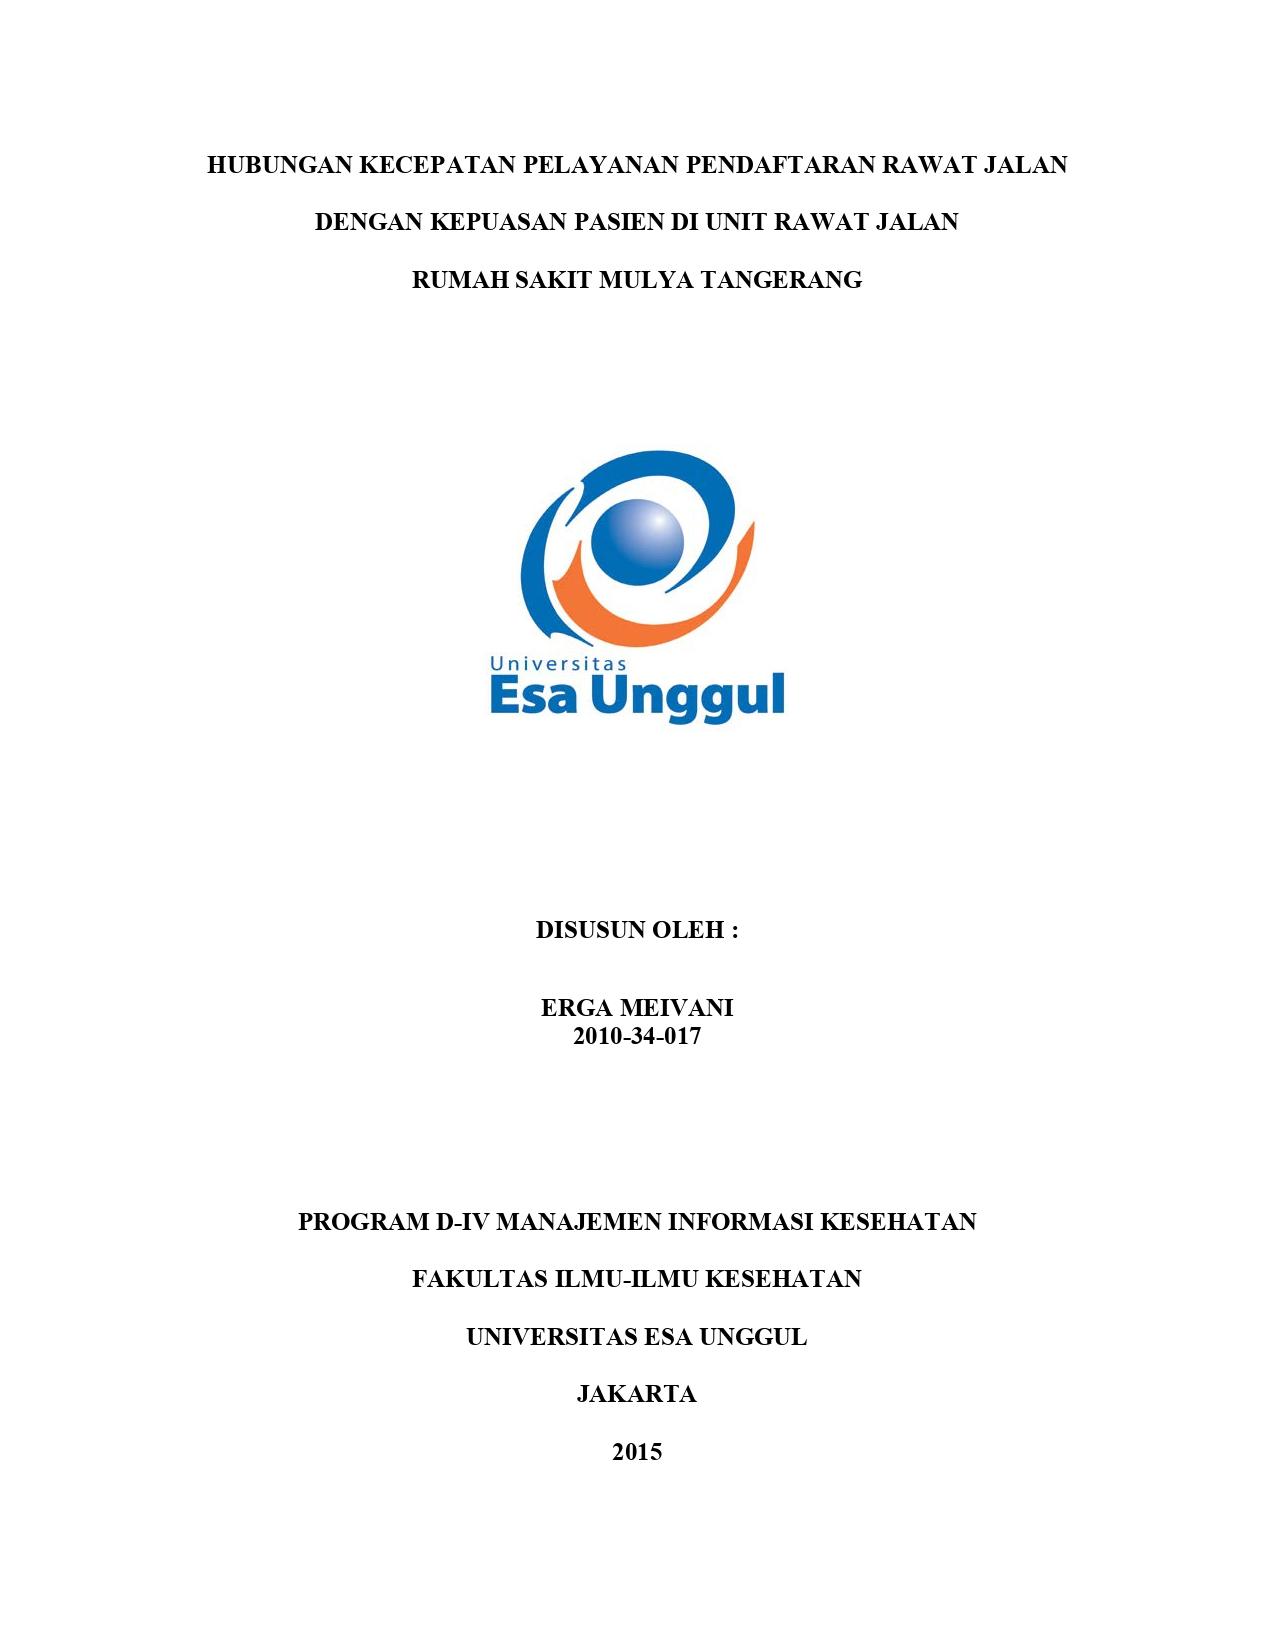 Hubungan Kecepatan Pelayanan Pendaftaran Rawat Jalan dengan Kepuasan Pasien di Unit Rawat Jalan Rumah Sakit Mulya Tangerang